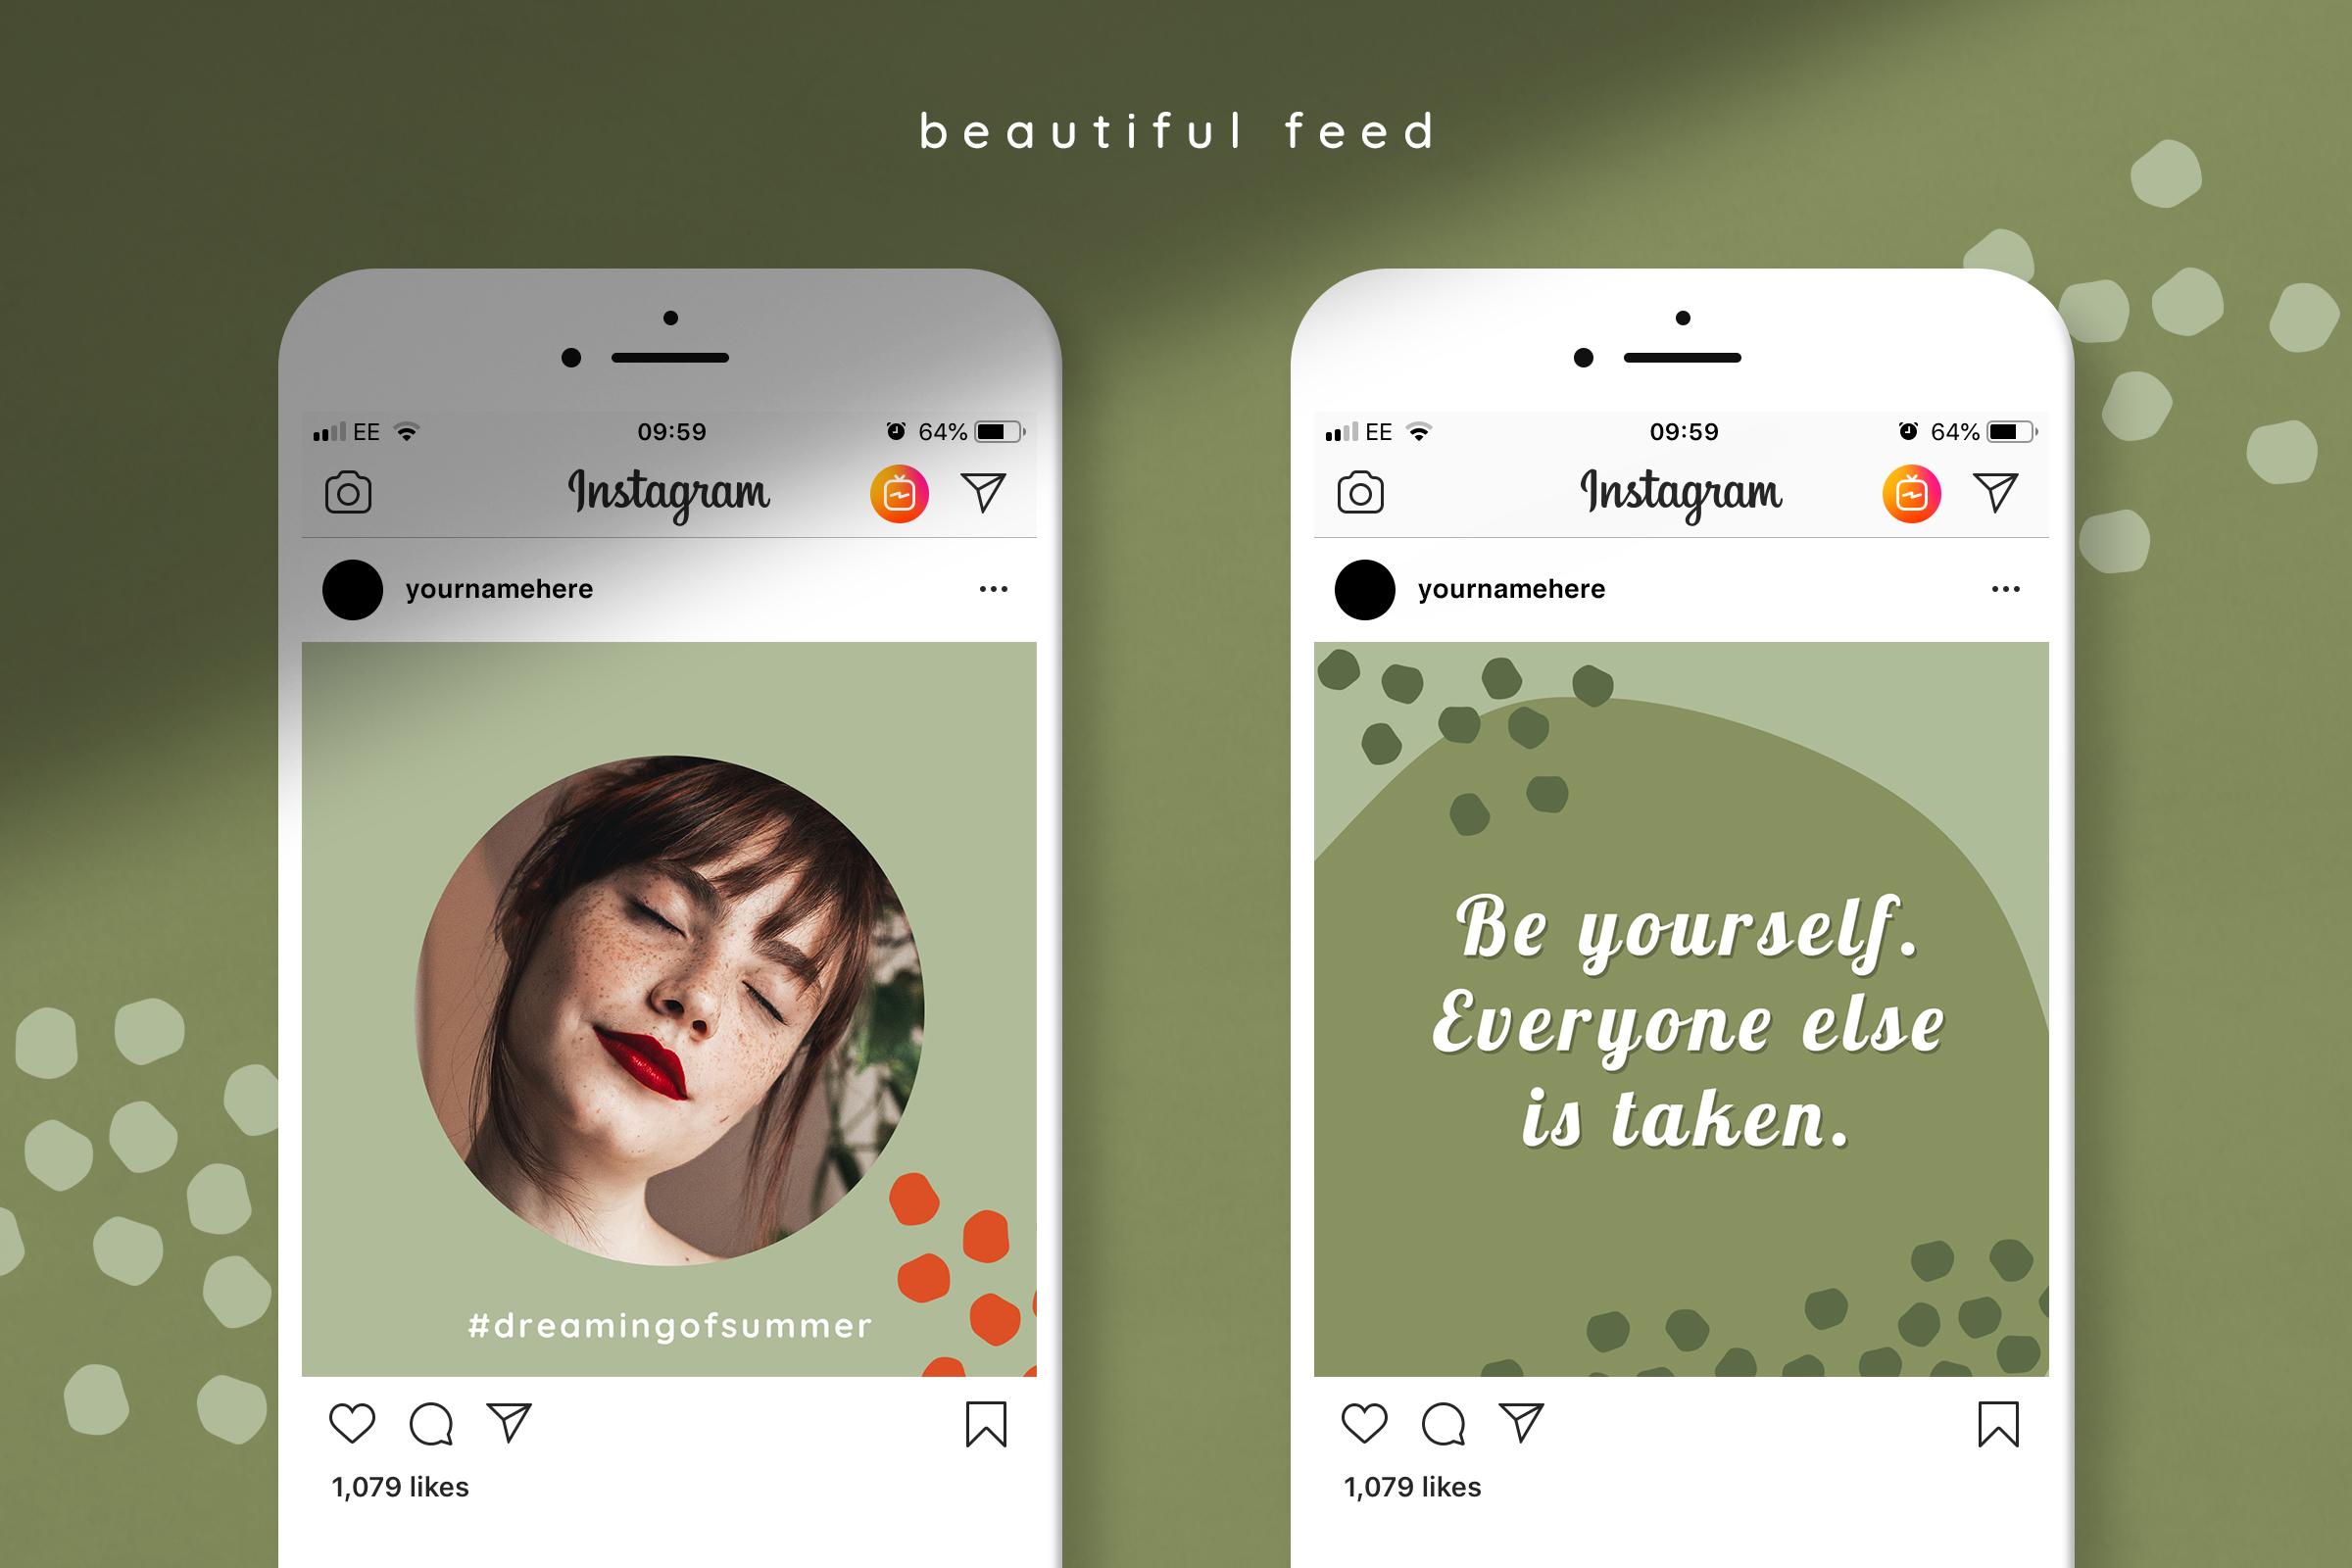 摄影照片朋友圈展示INS风模板图文排版PSD海报 Instagram Quotes Puzzle Template插图(4)